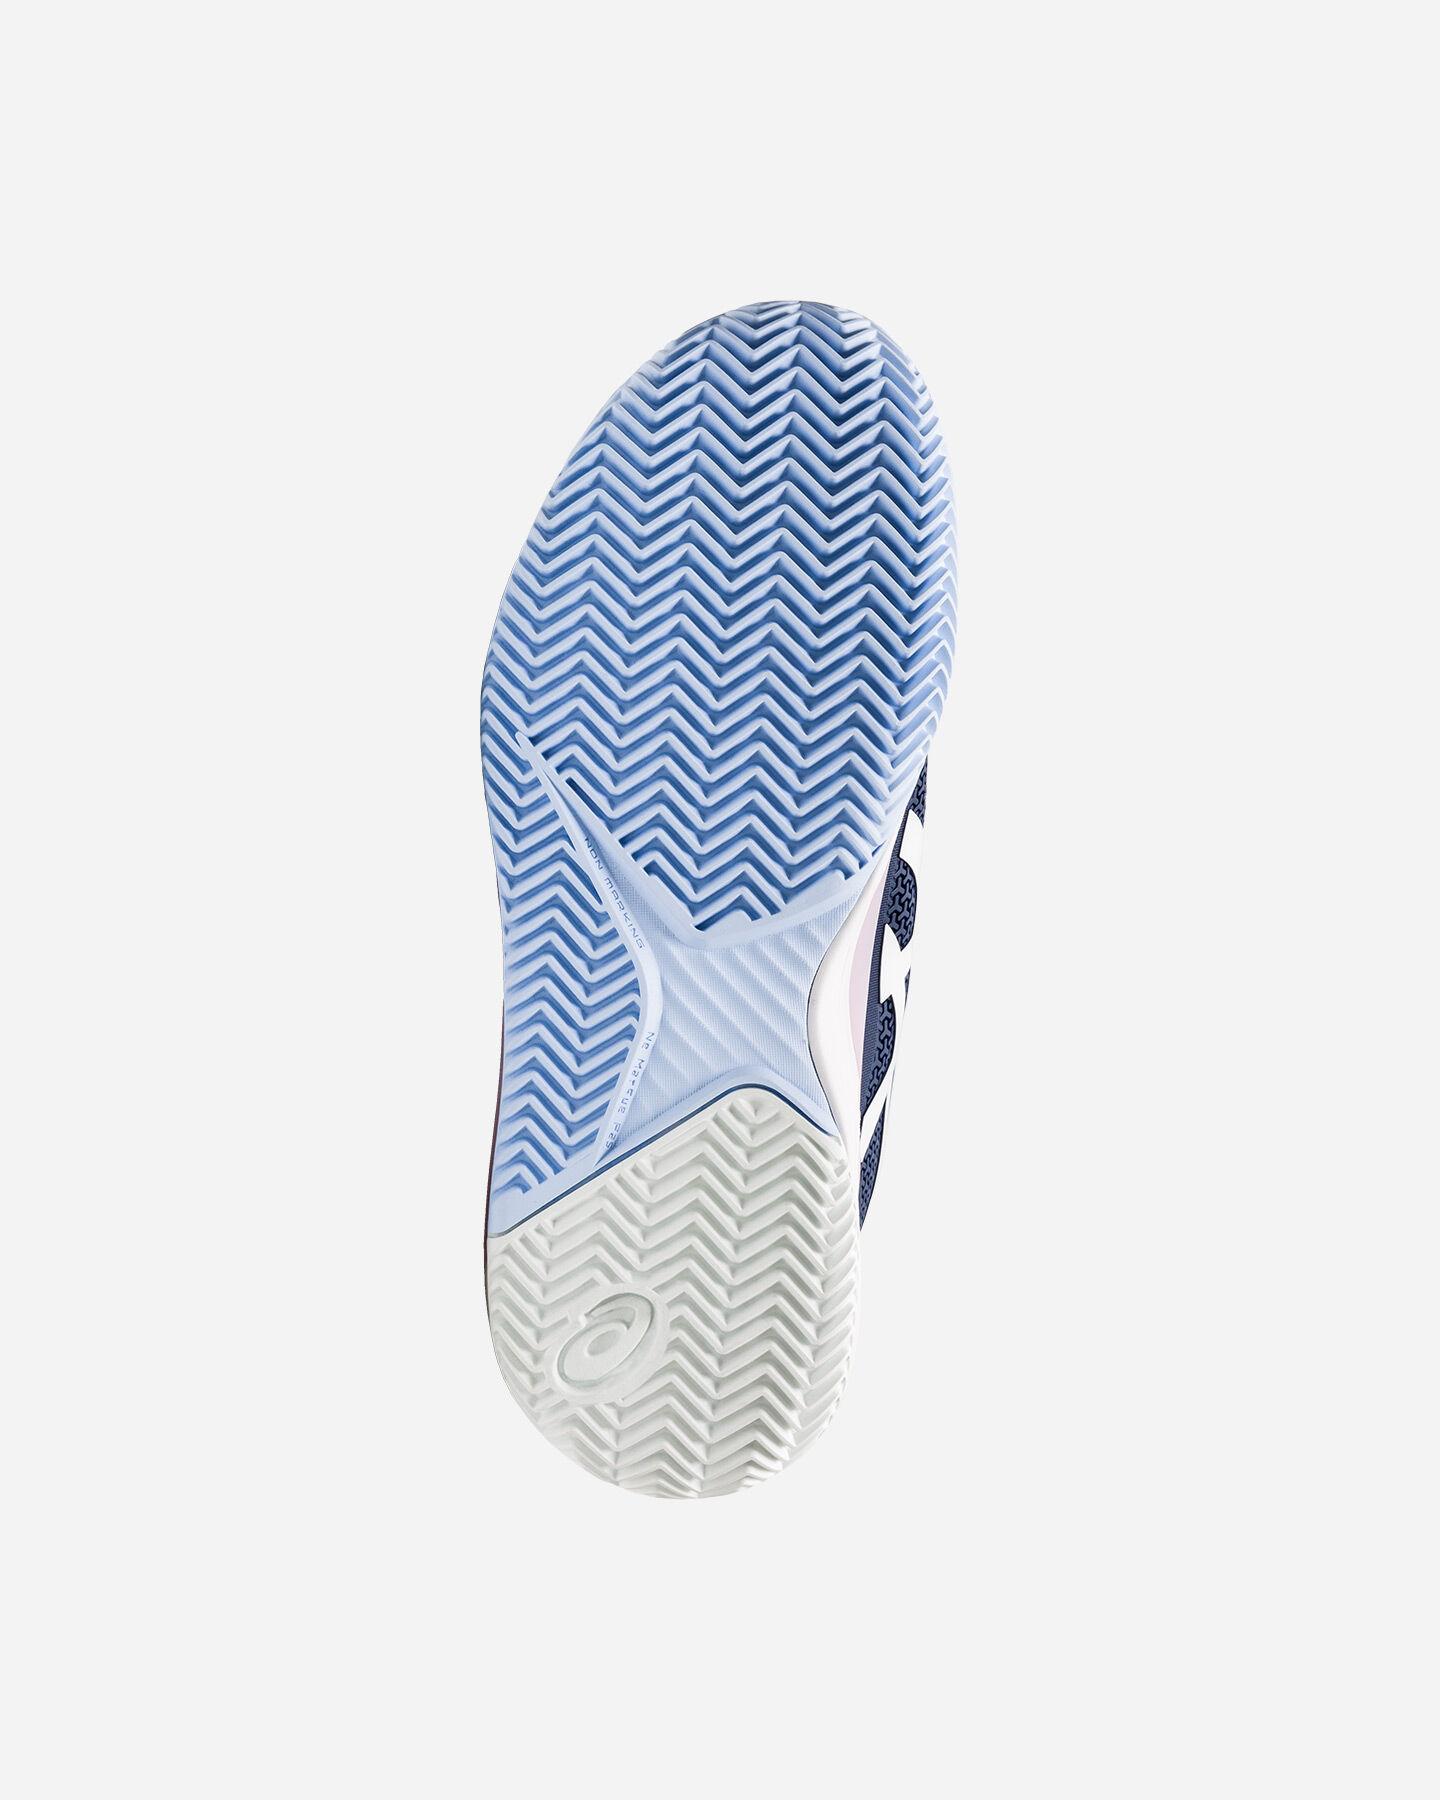 Scarpe tennis ASICS GEL-RESOLUTION 8 CLAY W S5159482 scatto 3